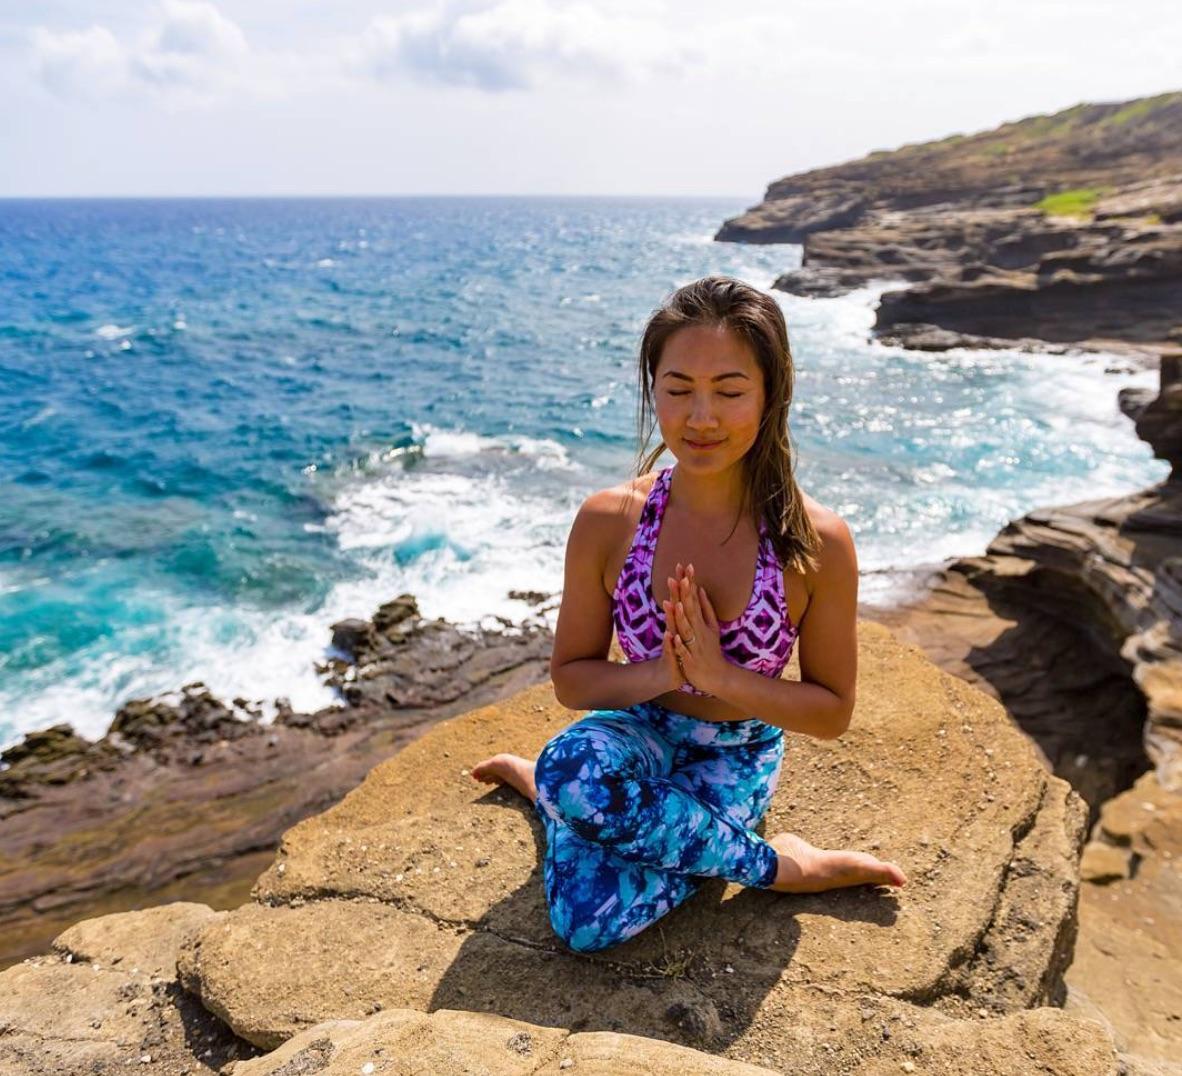 Chrystal Pearl Yogathon